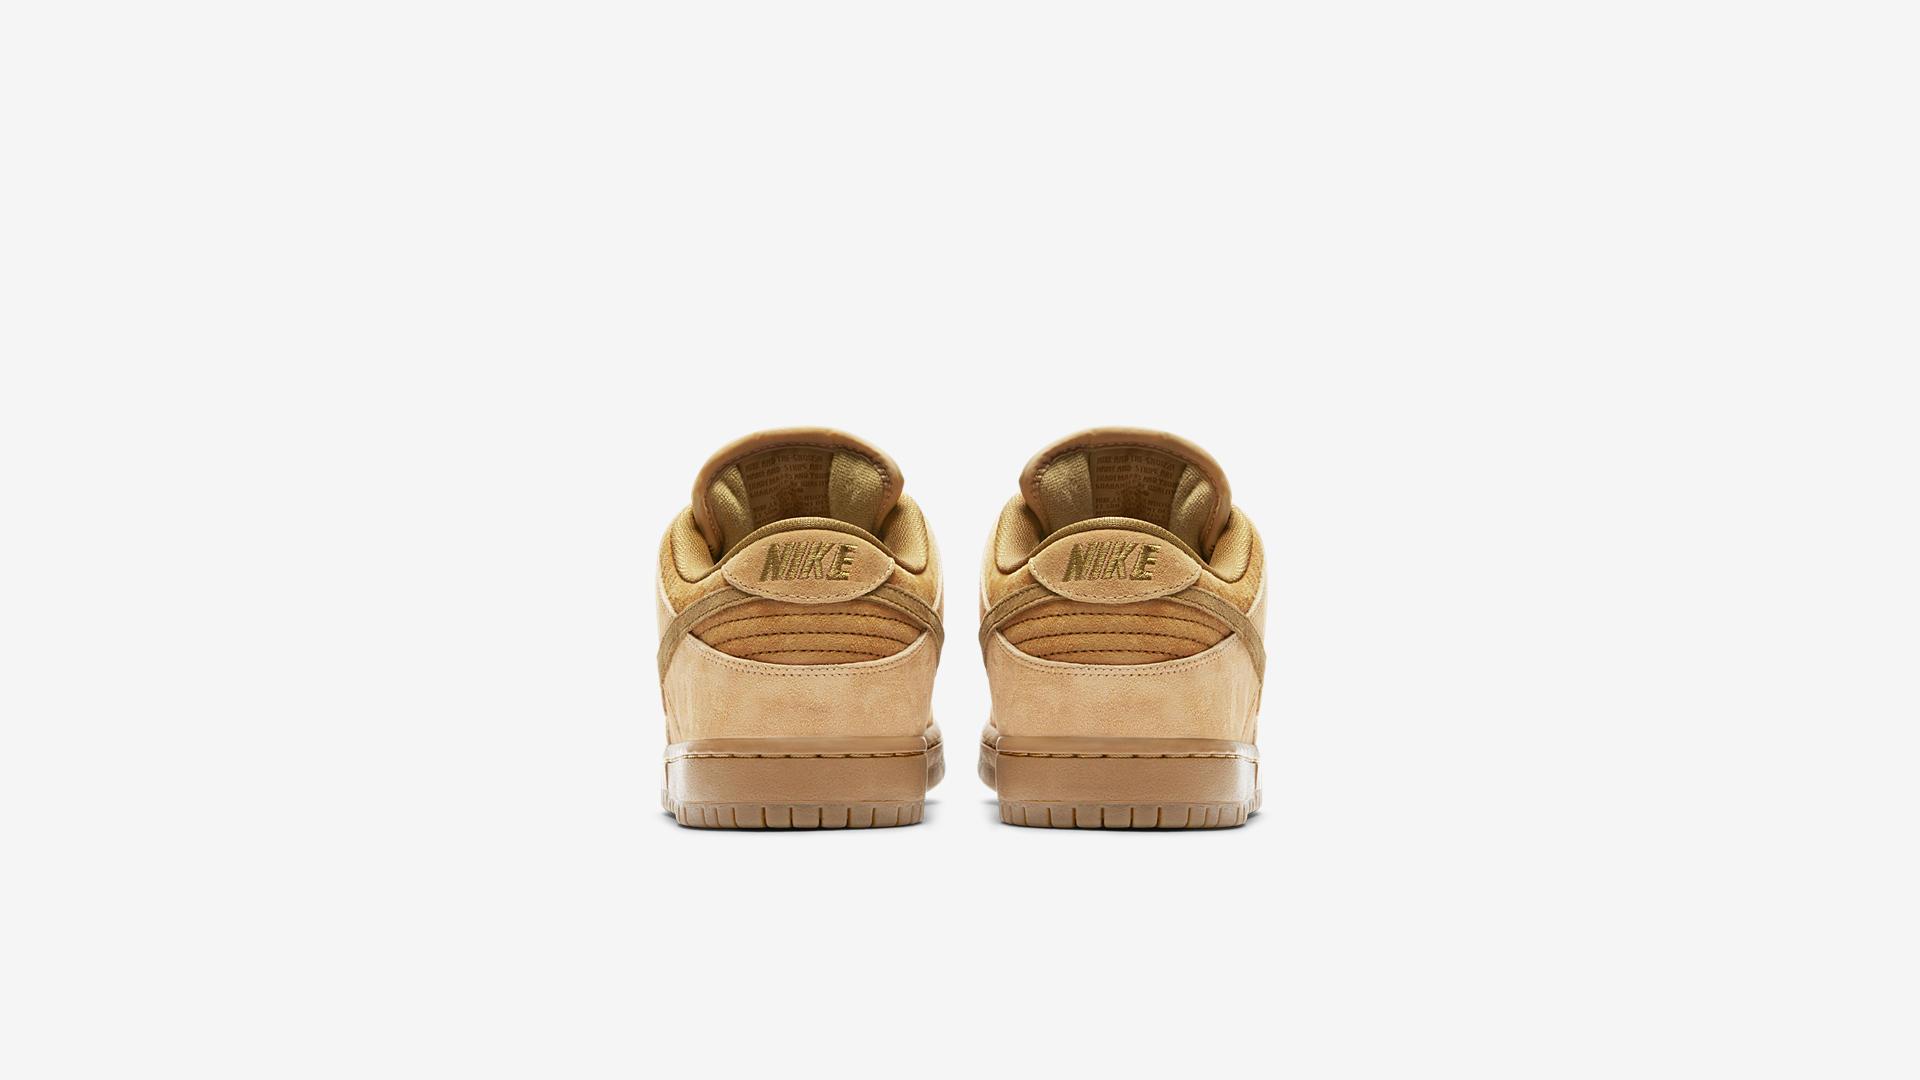 Nike SB Dunk Low Pro Wheat 883232 700 1